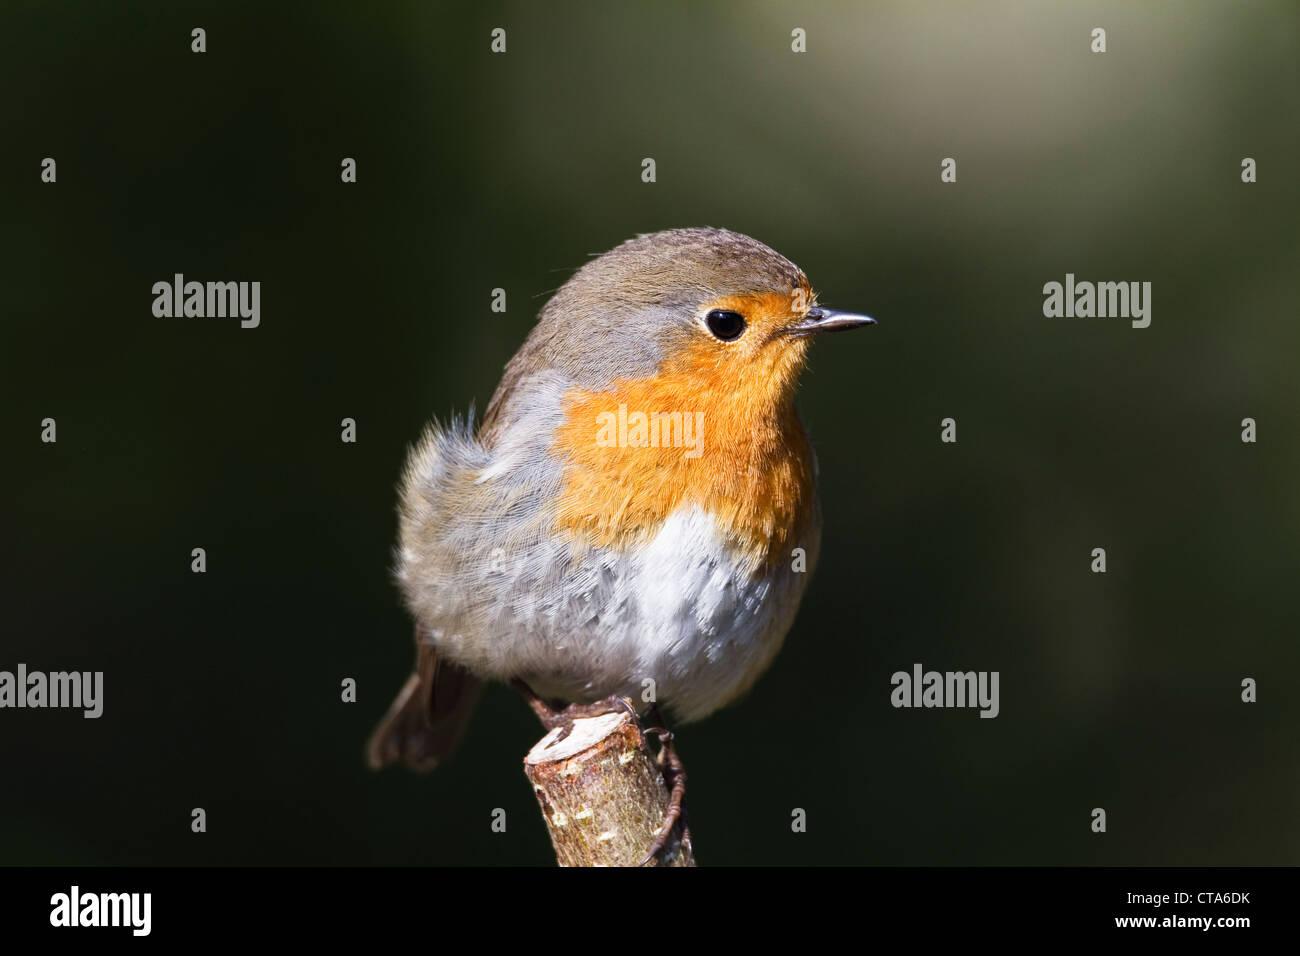 European Robin (Erithacus rubecula), Bavaria, Germany - Stock Image